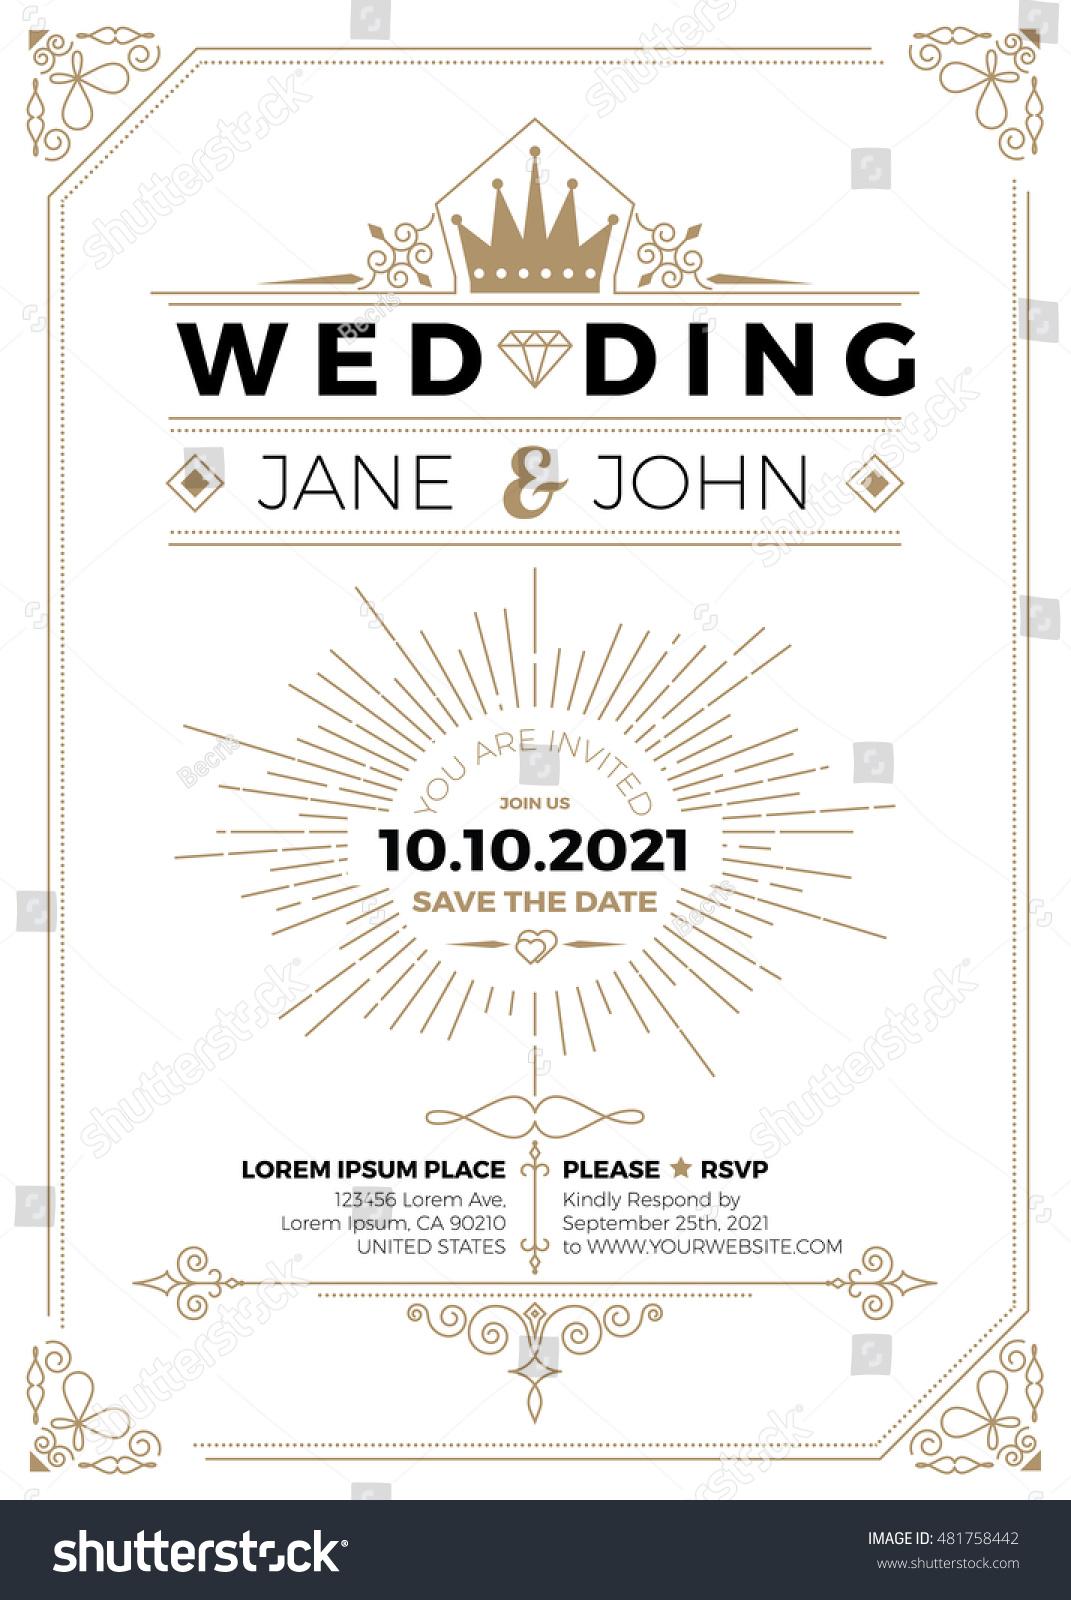 Vintage Wedding Invitation Card A5 Size Stock Vector 481758442